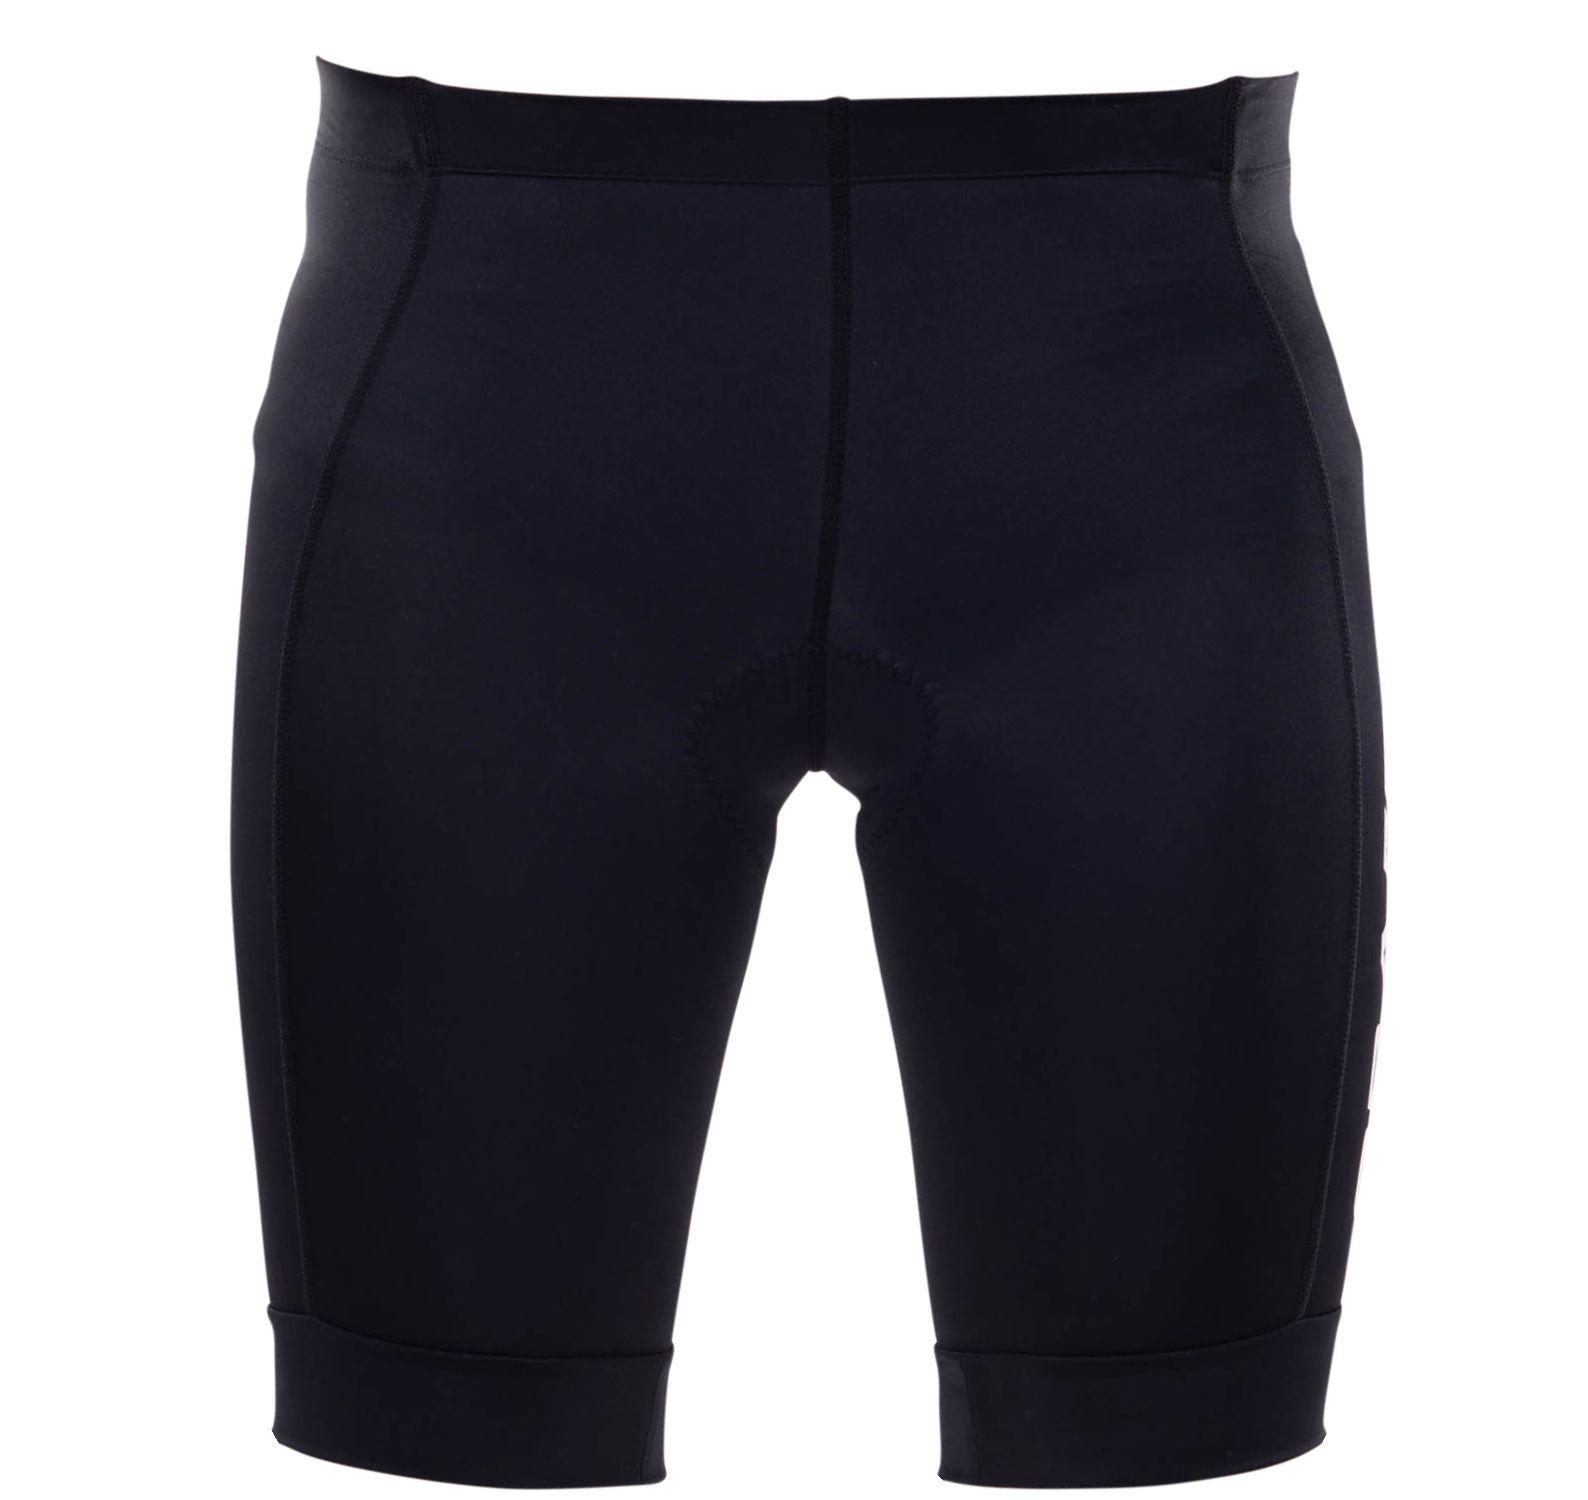 adopt shorts m, black, l,  craft